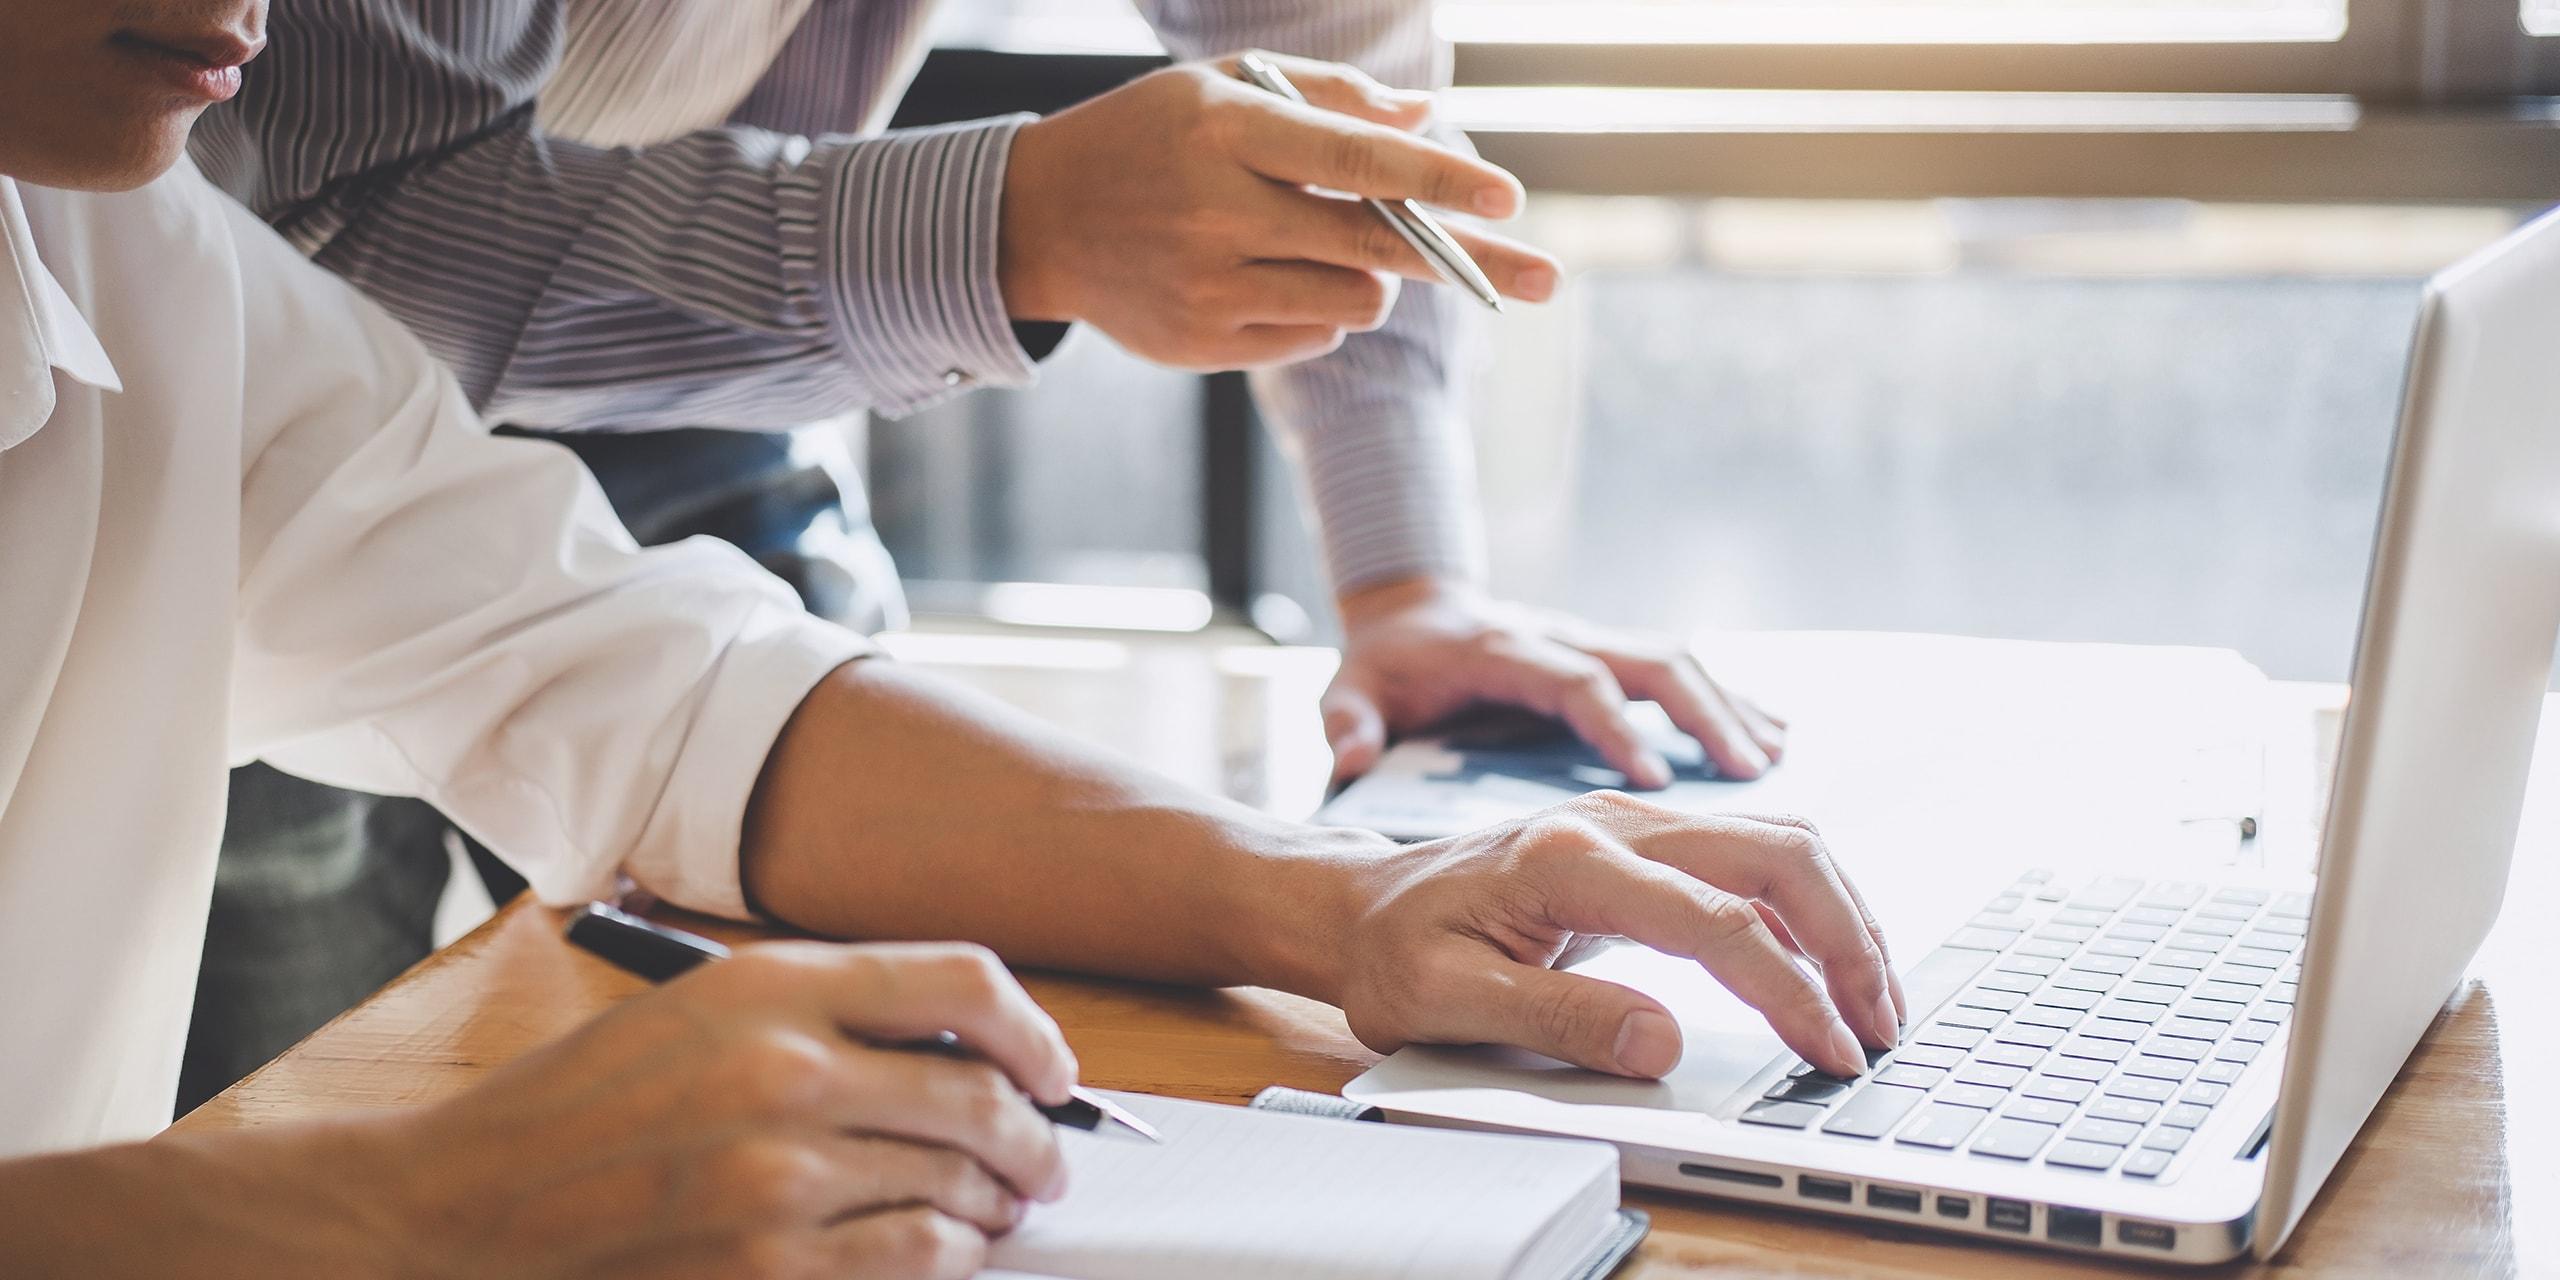 Employers Risk Services COBRA Insurance